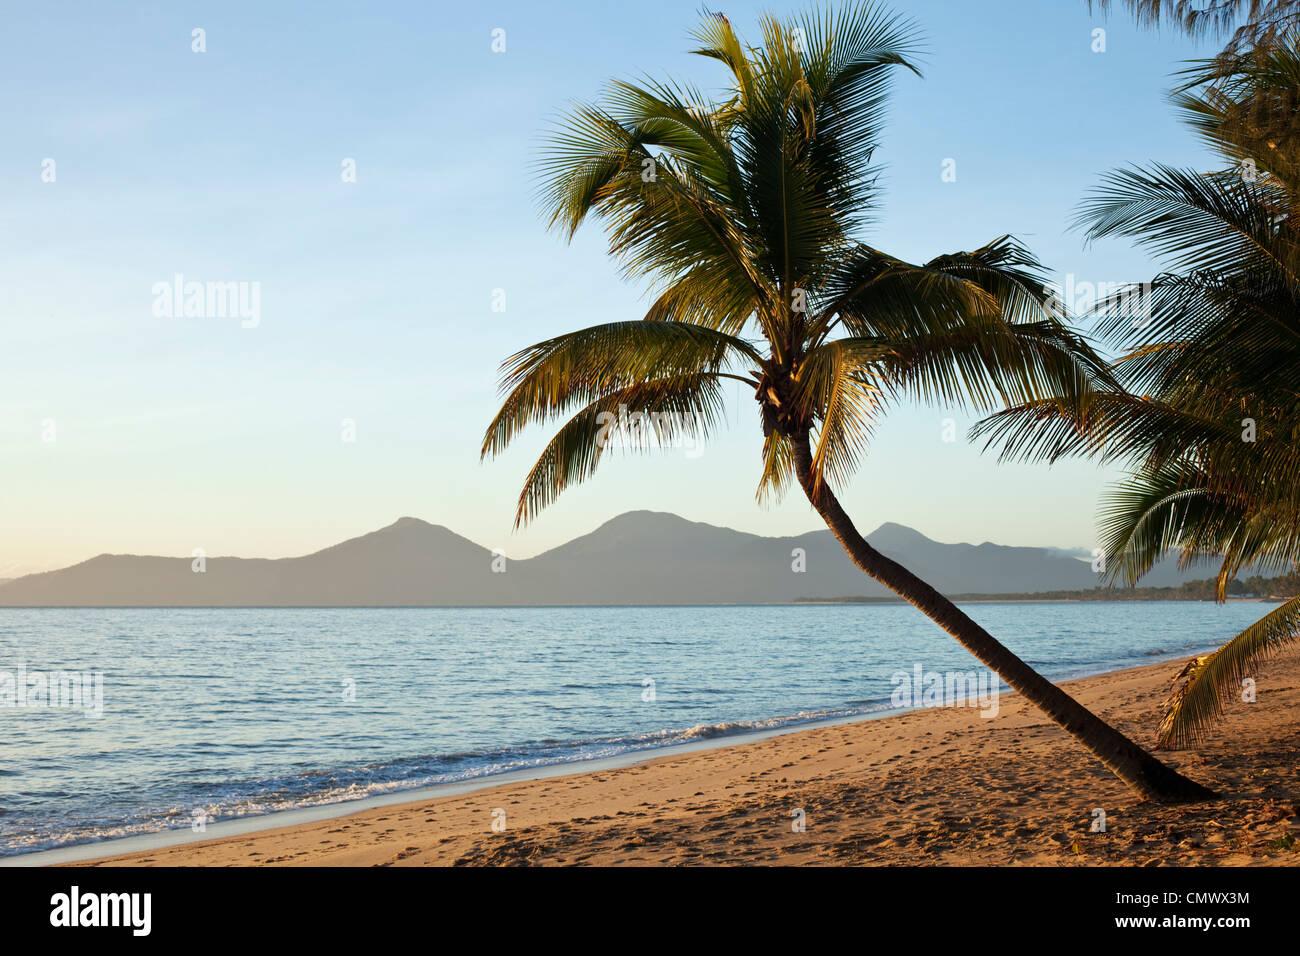 View along Holloways Beach at dawn. Cairns, Queensland, Australia - Stock Image